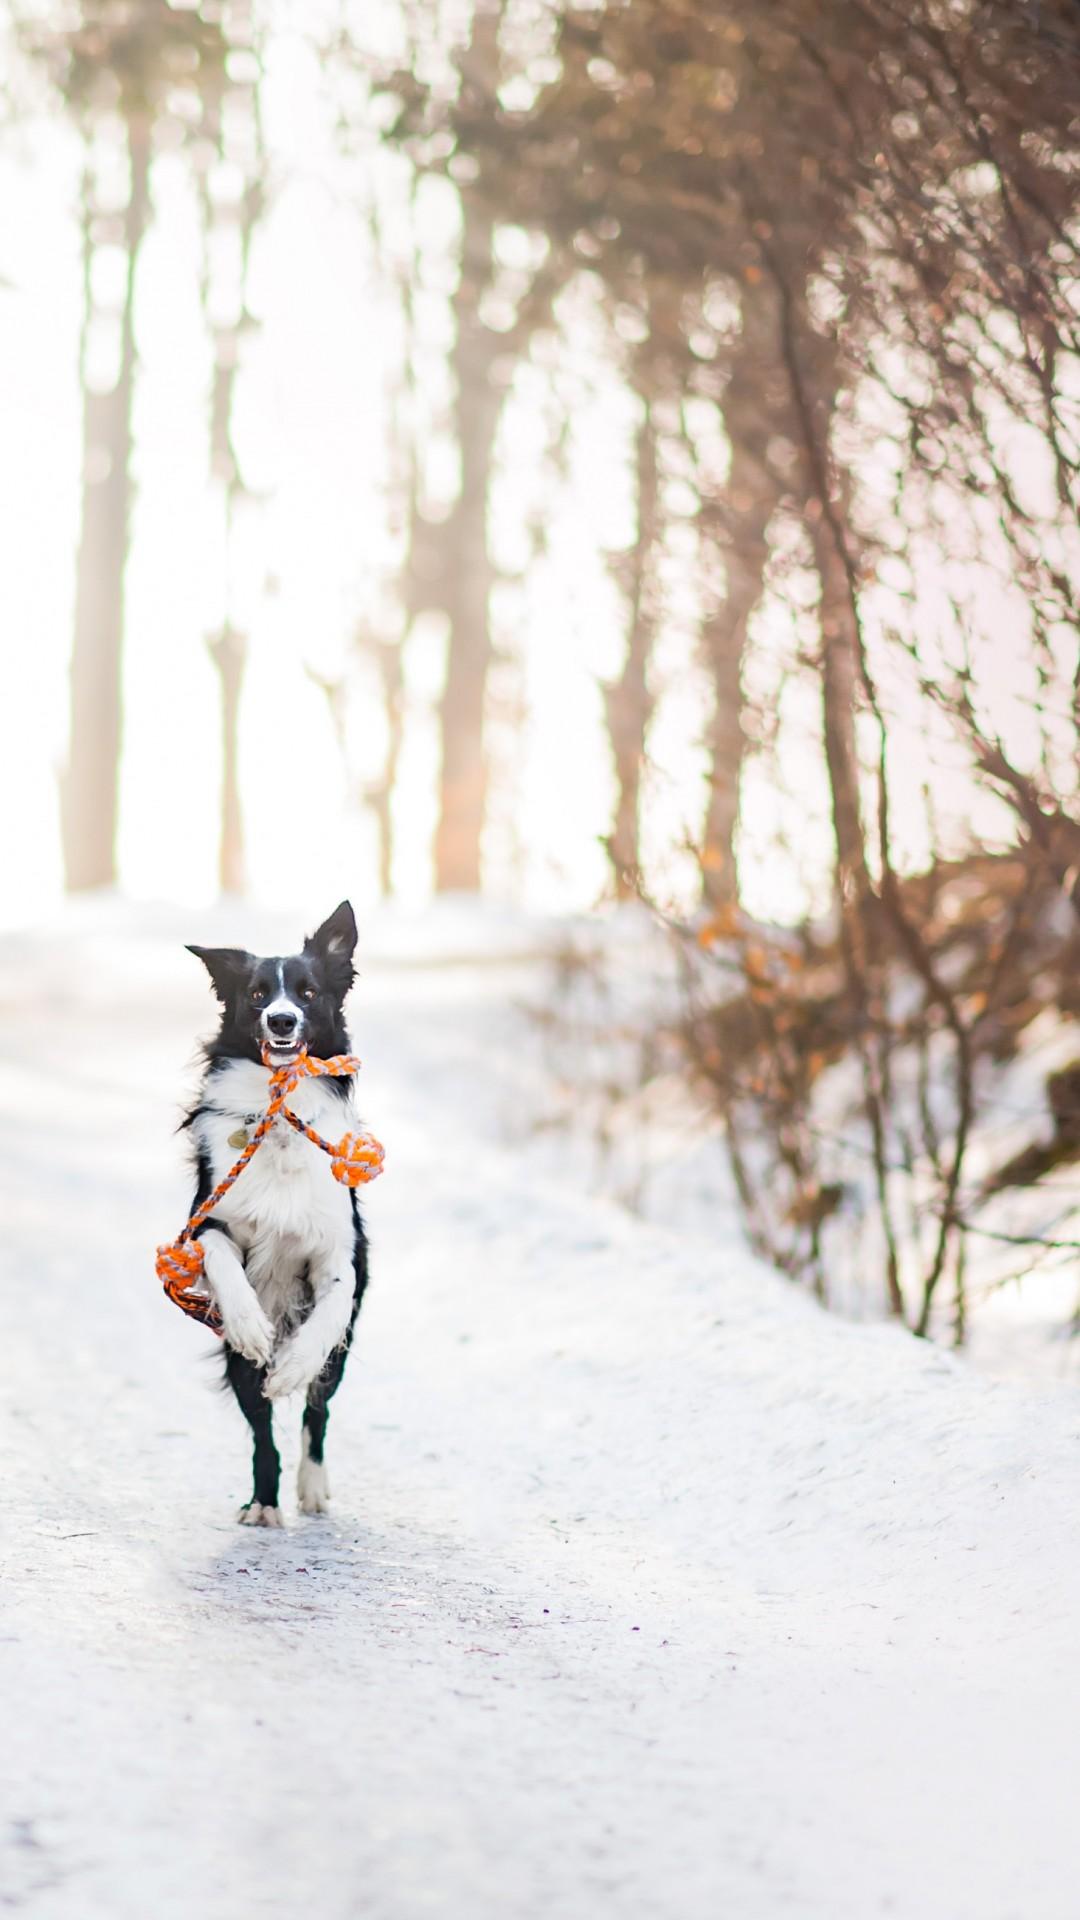 Wallpaper dog, cute animals, winter, snow, trees, 4k